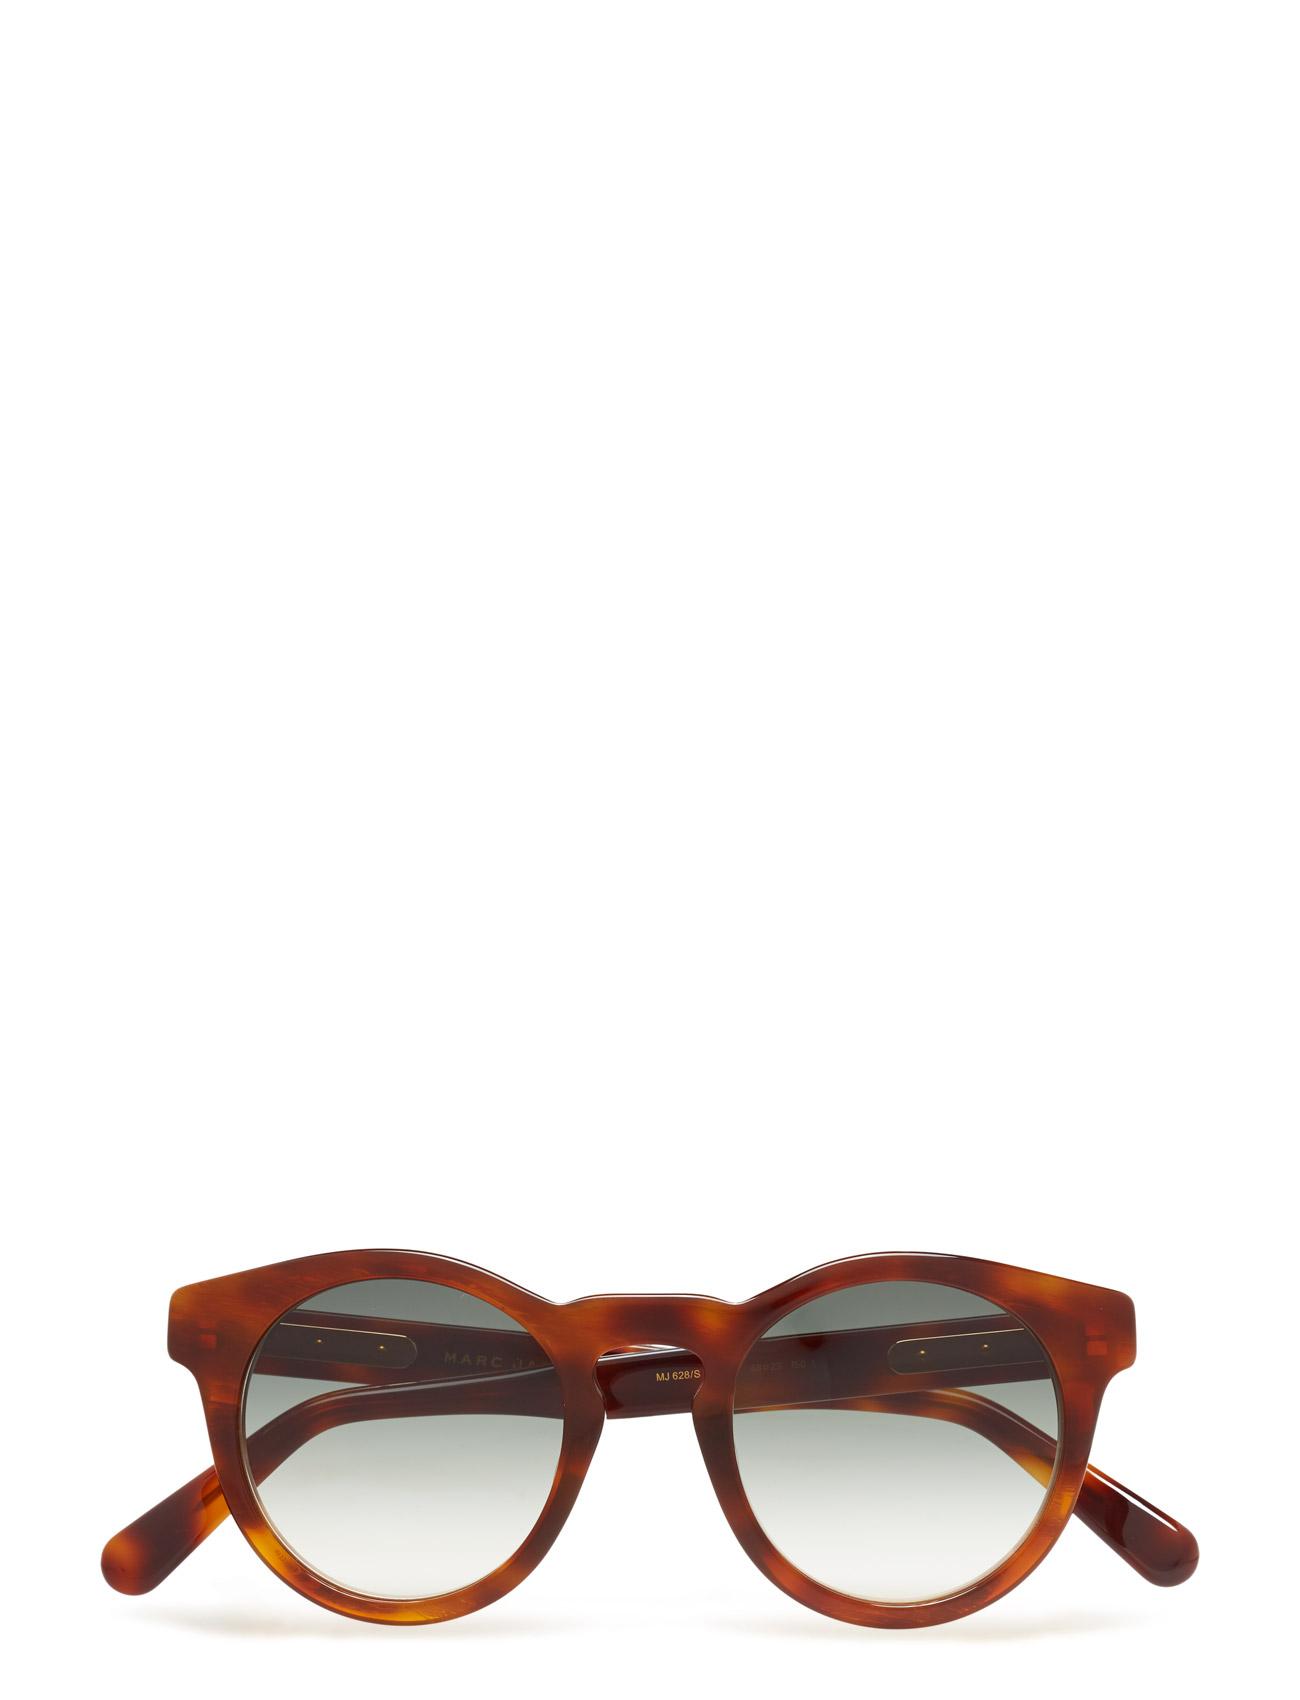 Mj 628/S Marc Jacobs Sunglasses Solbriller til Herrer i